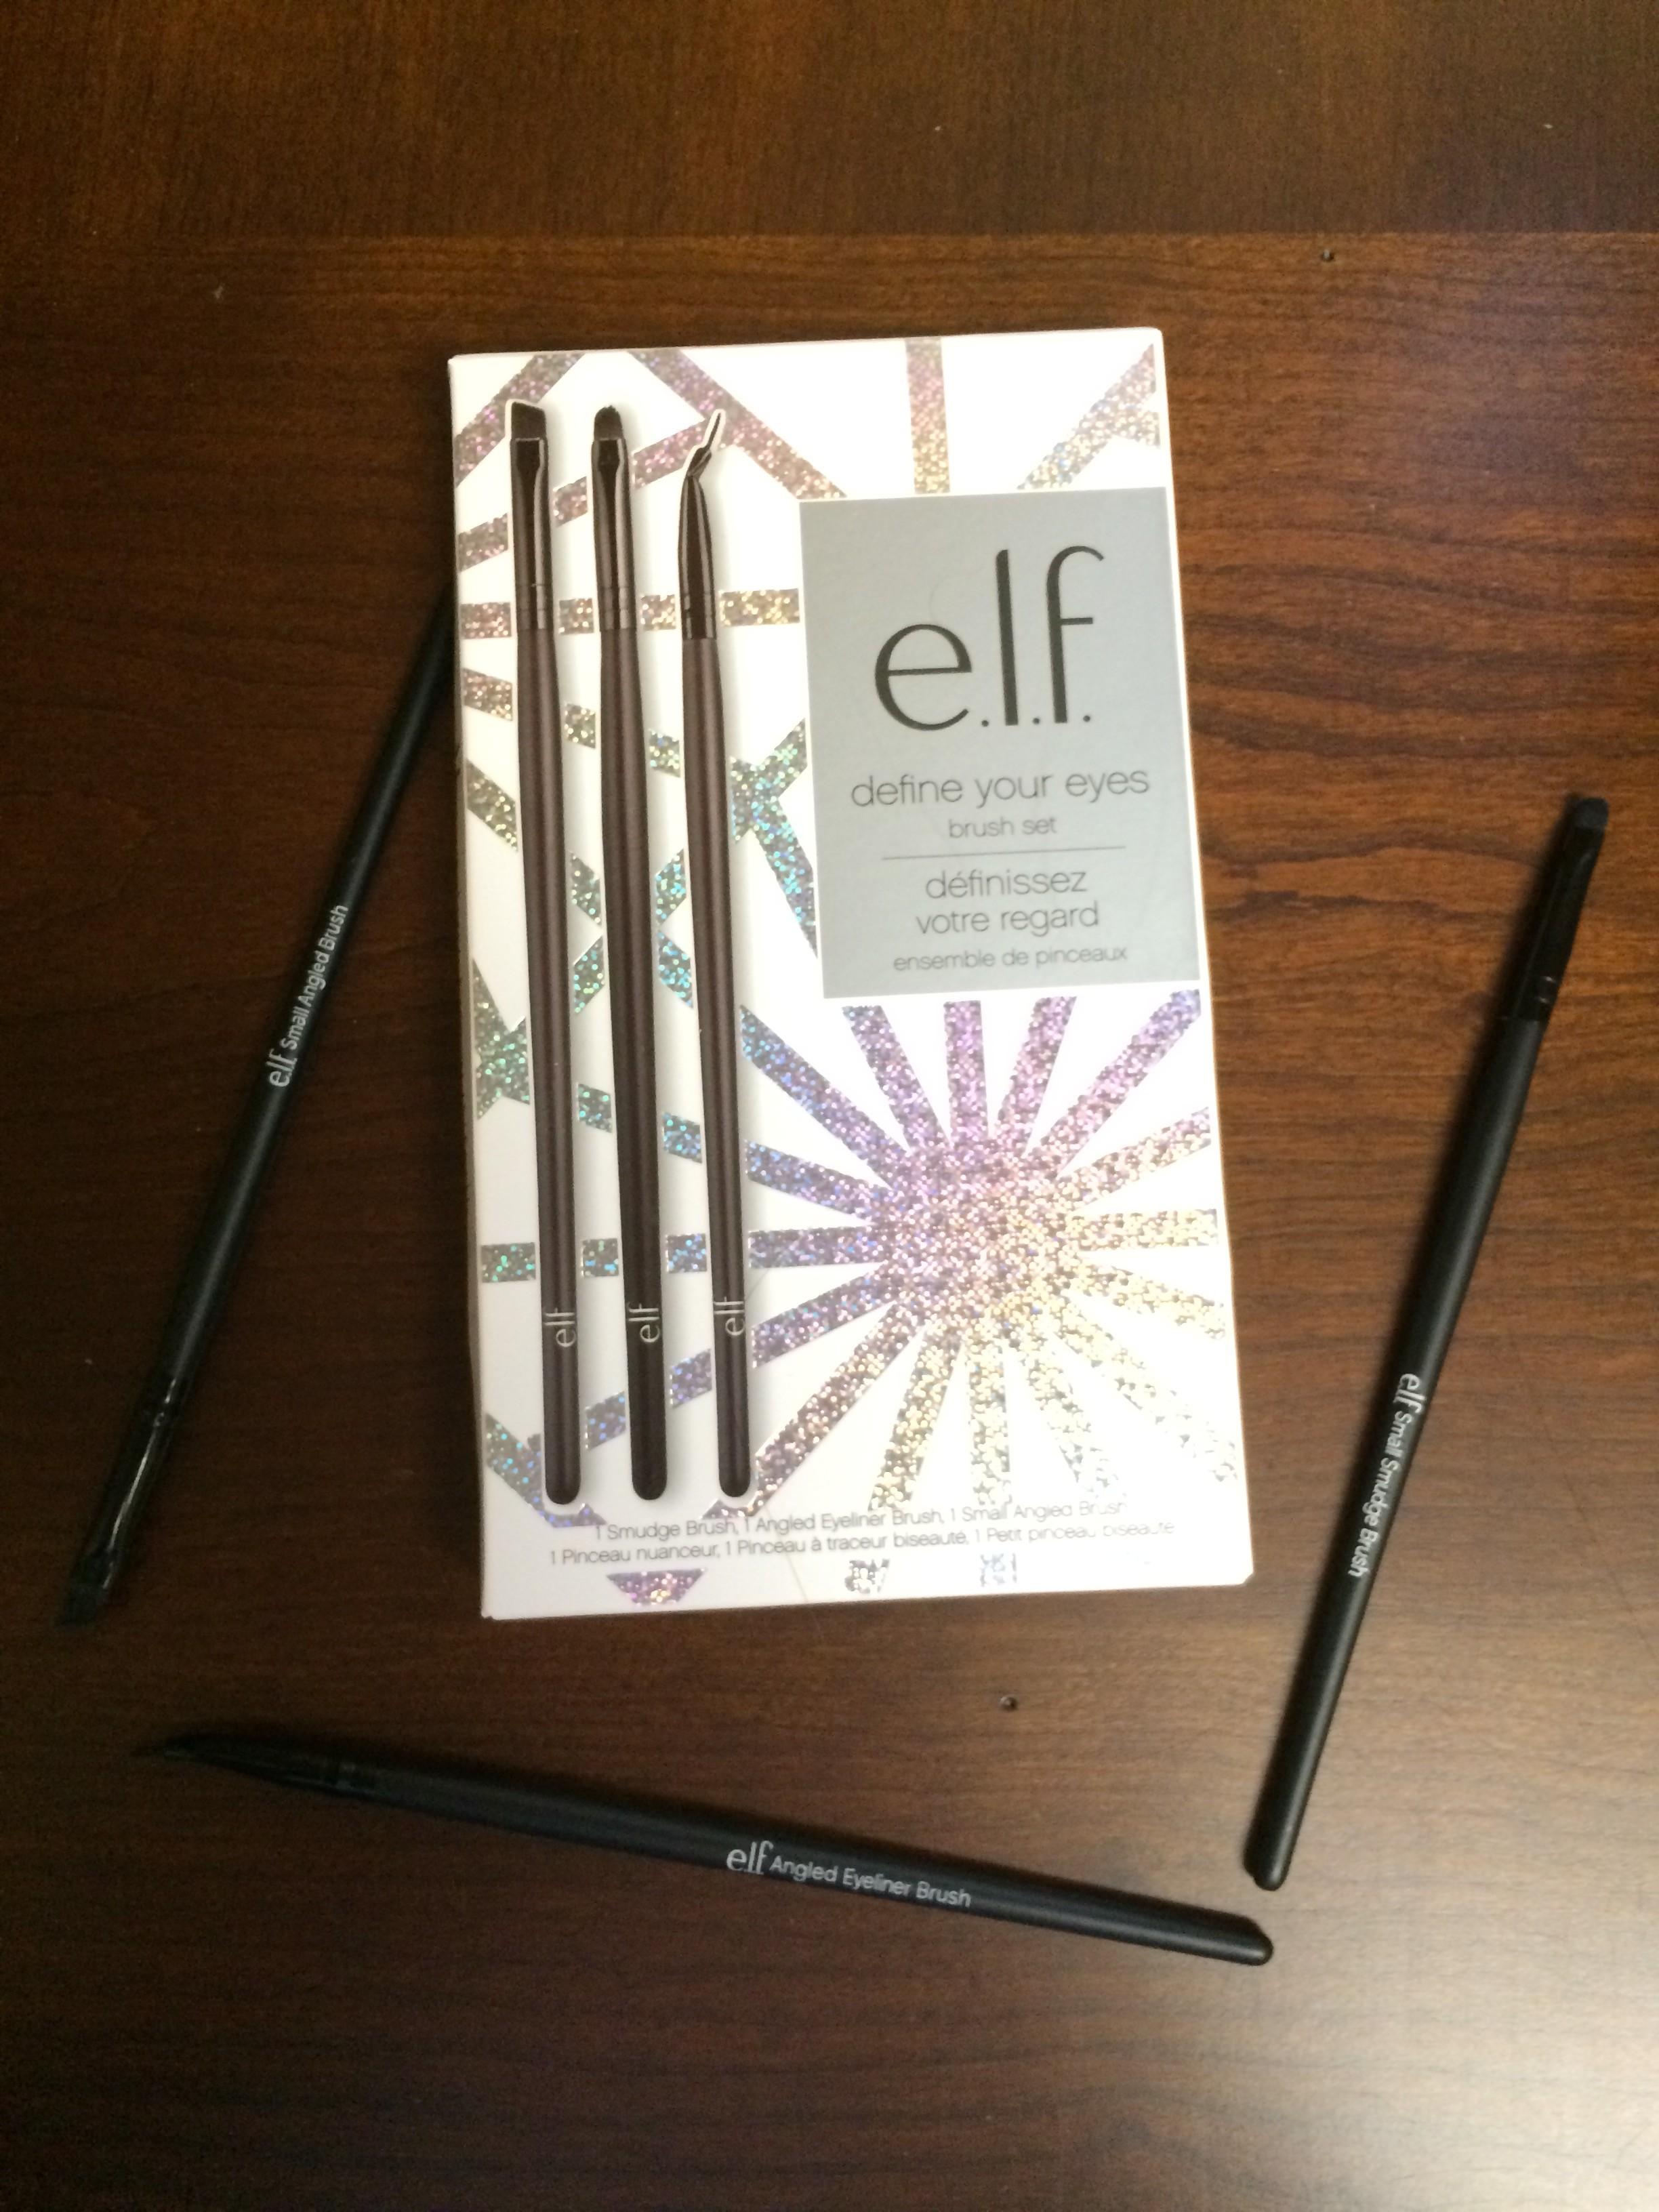 e.l.f. define your eyes brush set